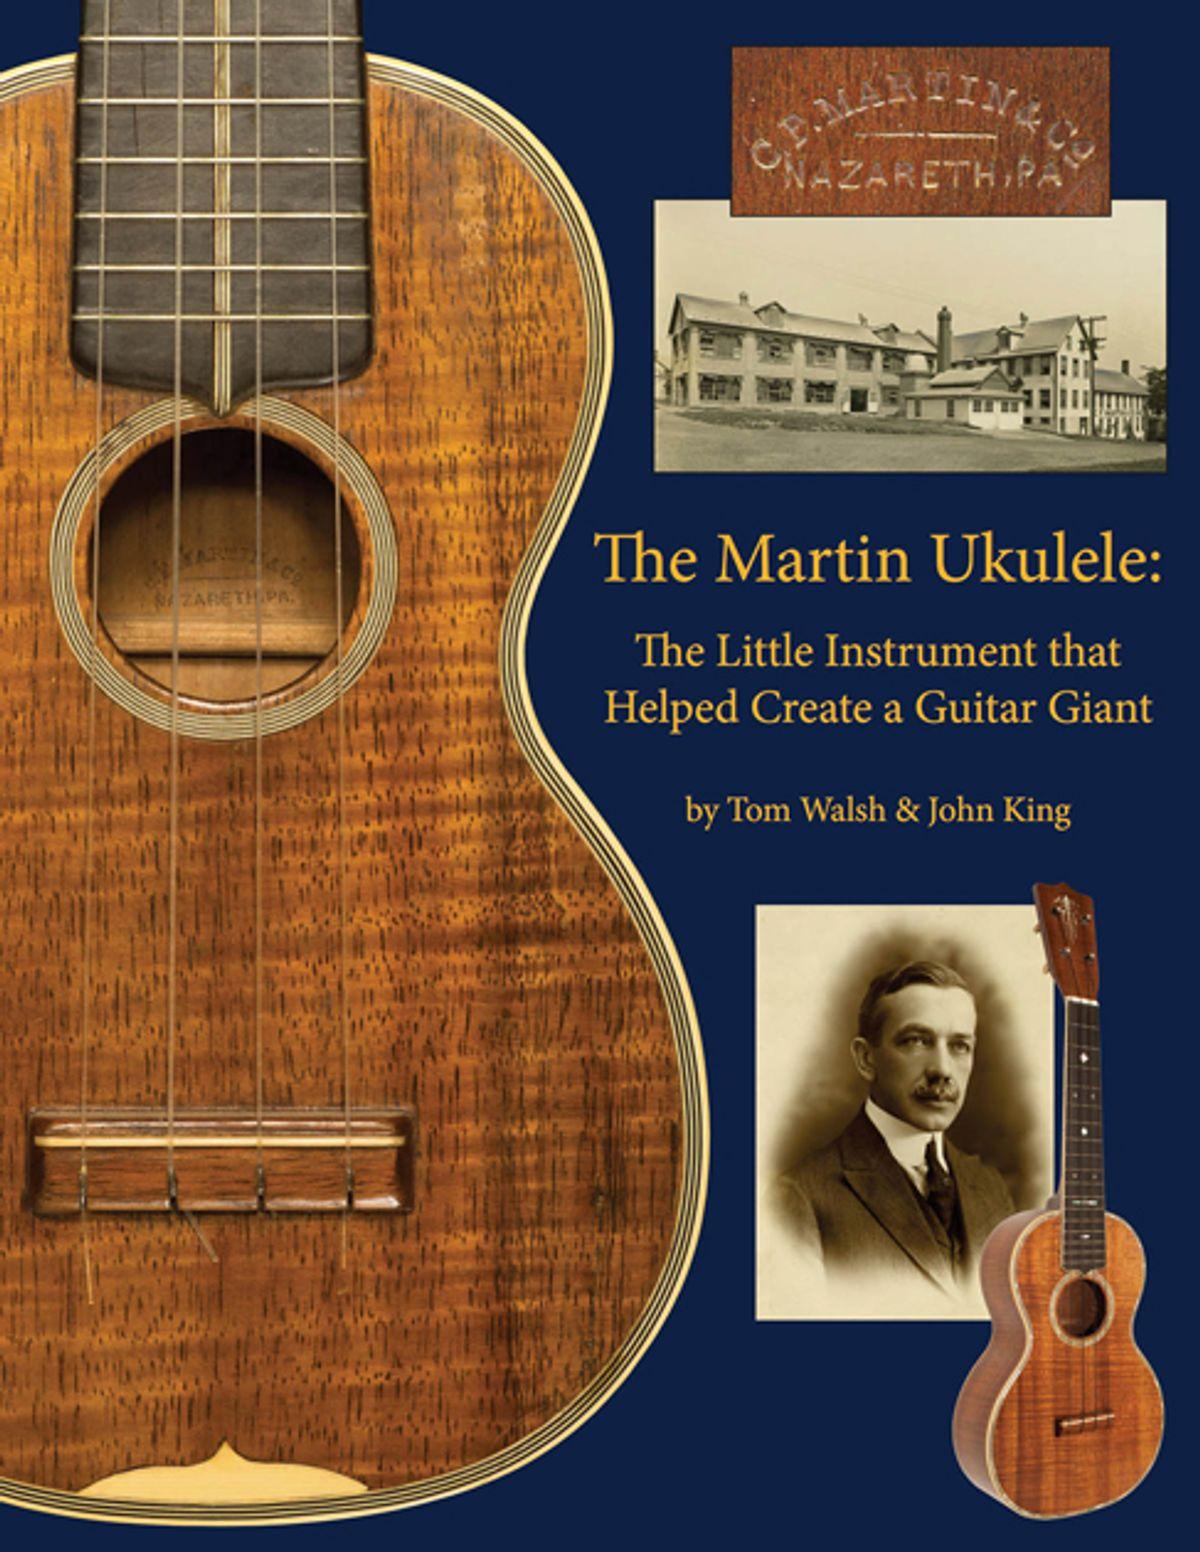 Hal Leonard Releases The Martin Ukulele Book